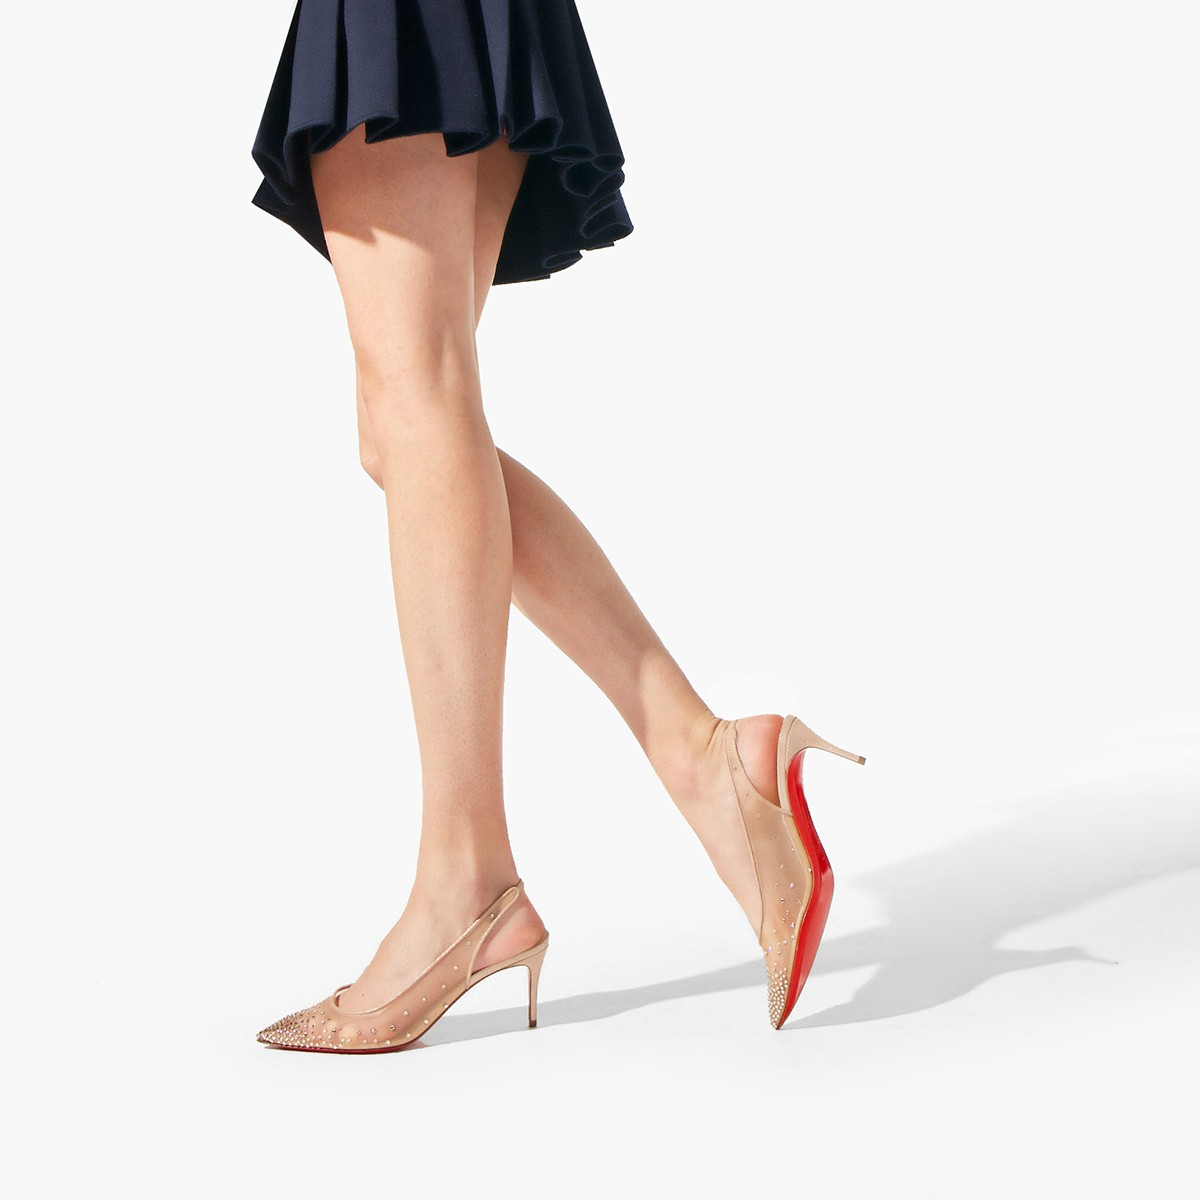 Shoes - Follies Strass Sling - Christian Louboutin